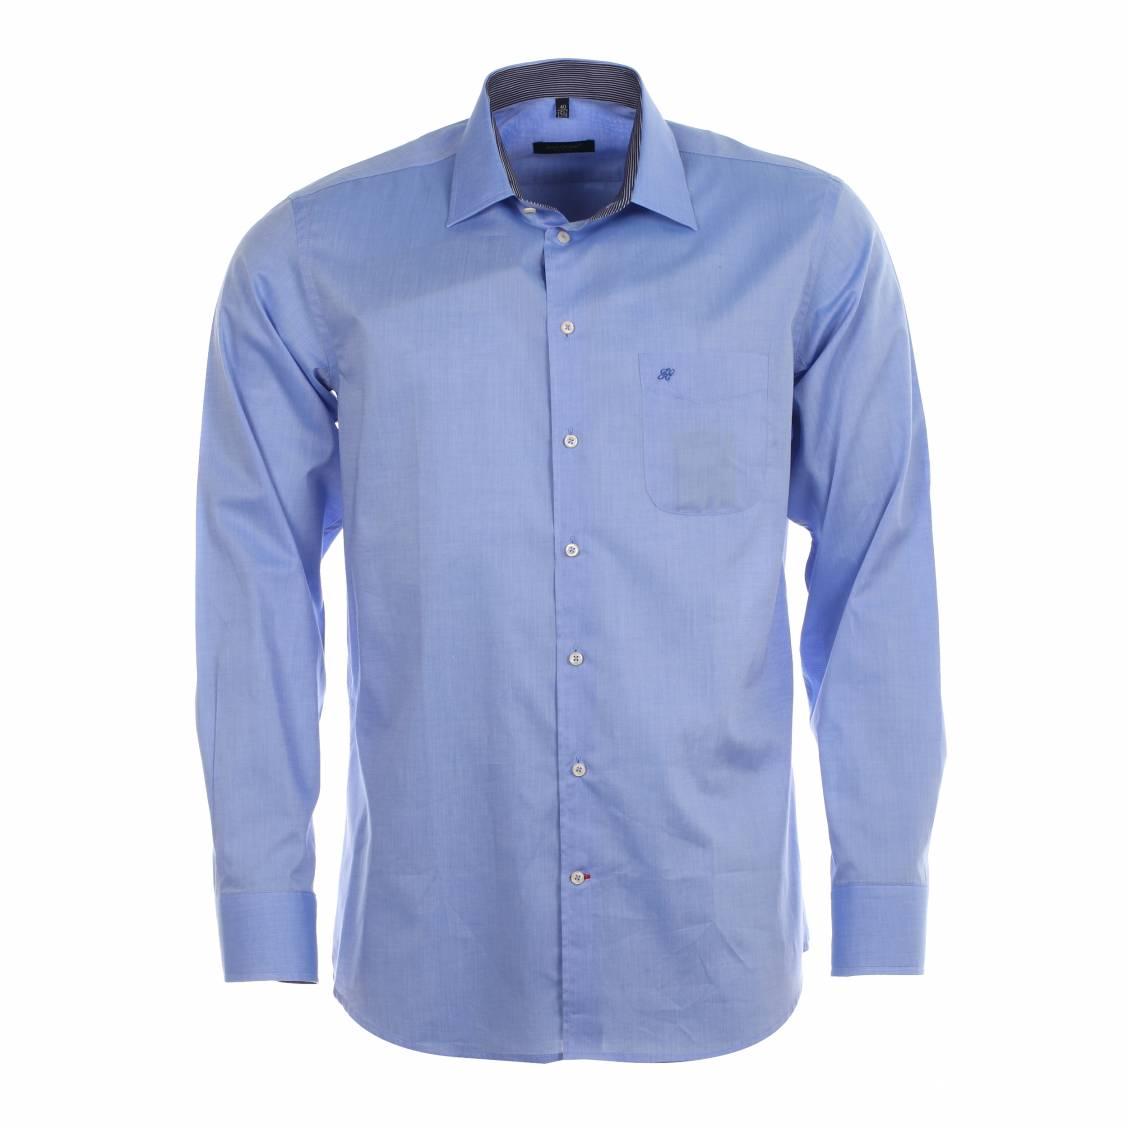 chemise homme droite jean chatel bleu ciel opposition rayures rue des hommes. Black Bedroom Furniture Sets. Home Design Ideas